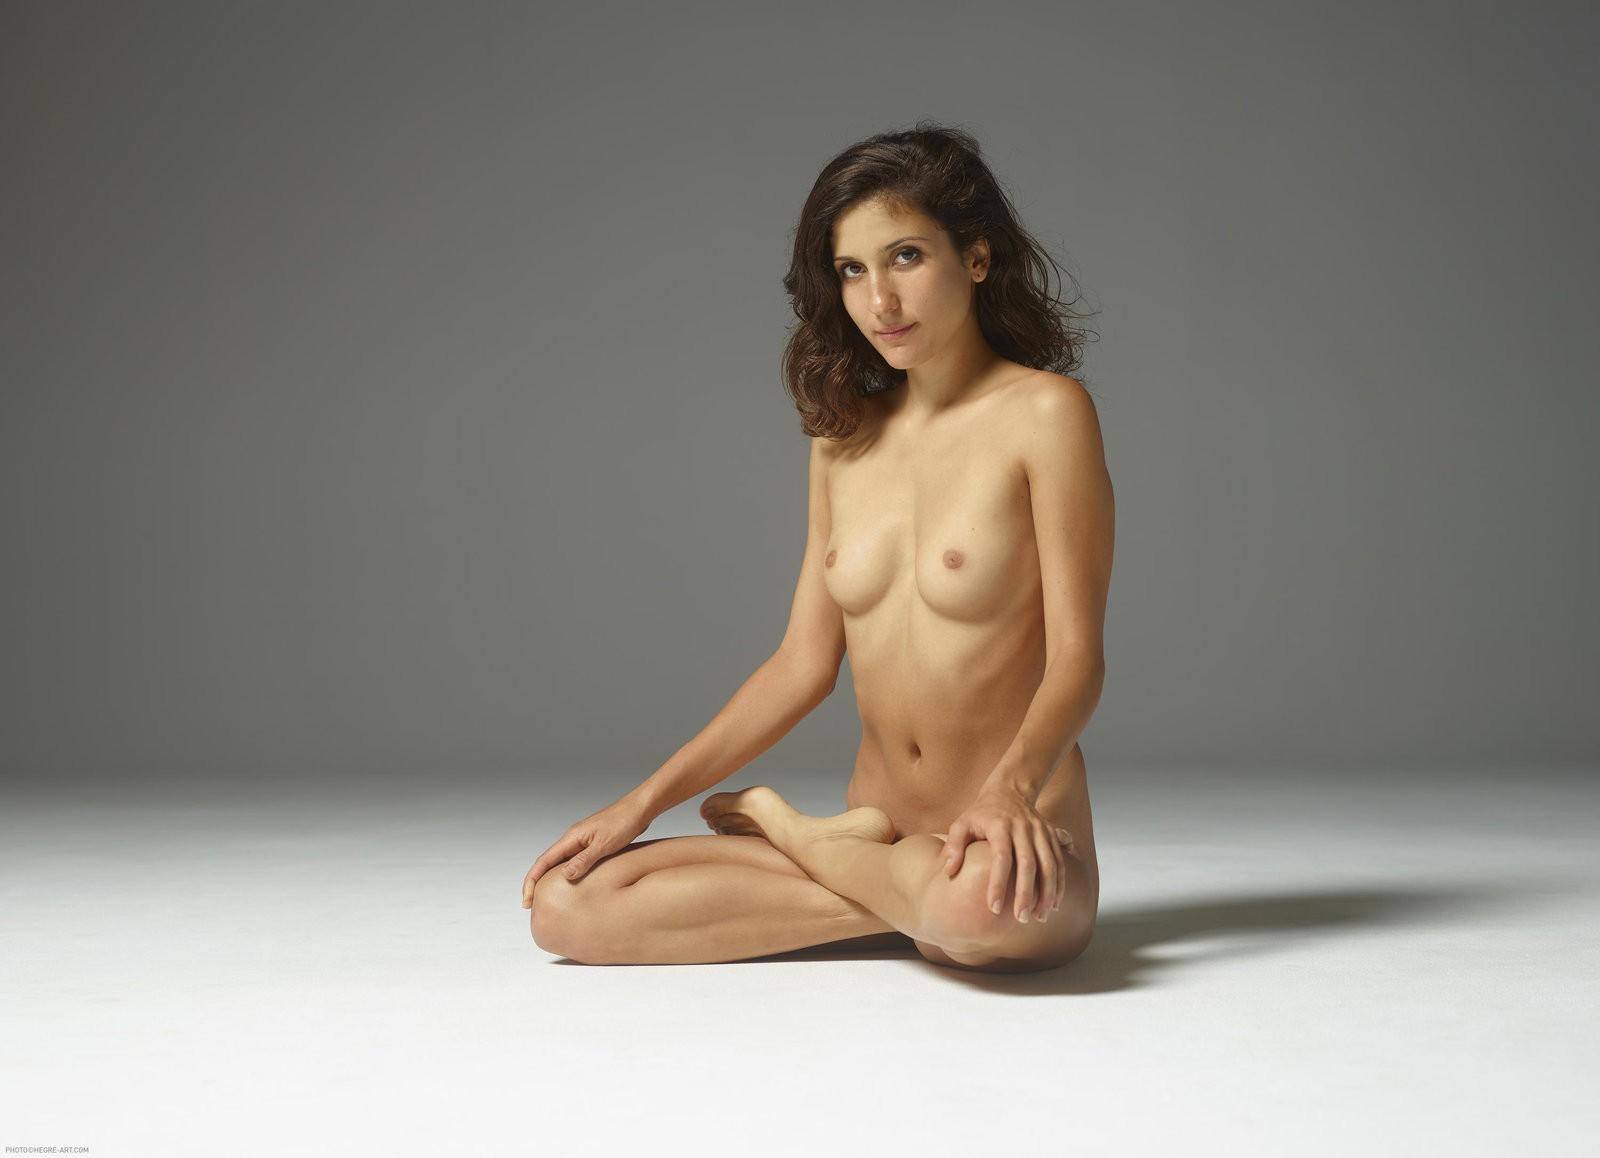 Стройная голая дамочка на полу - фото